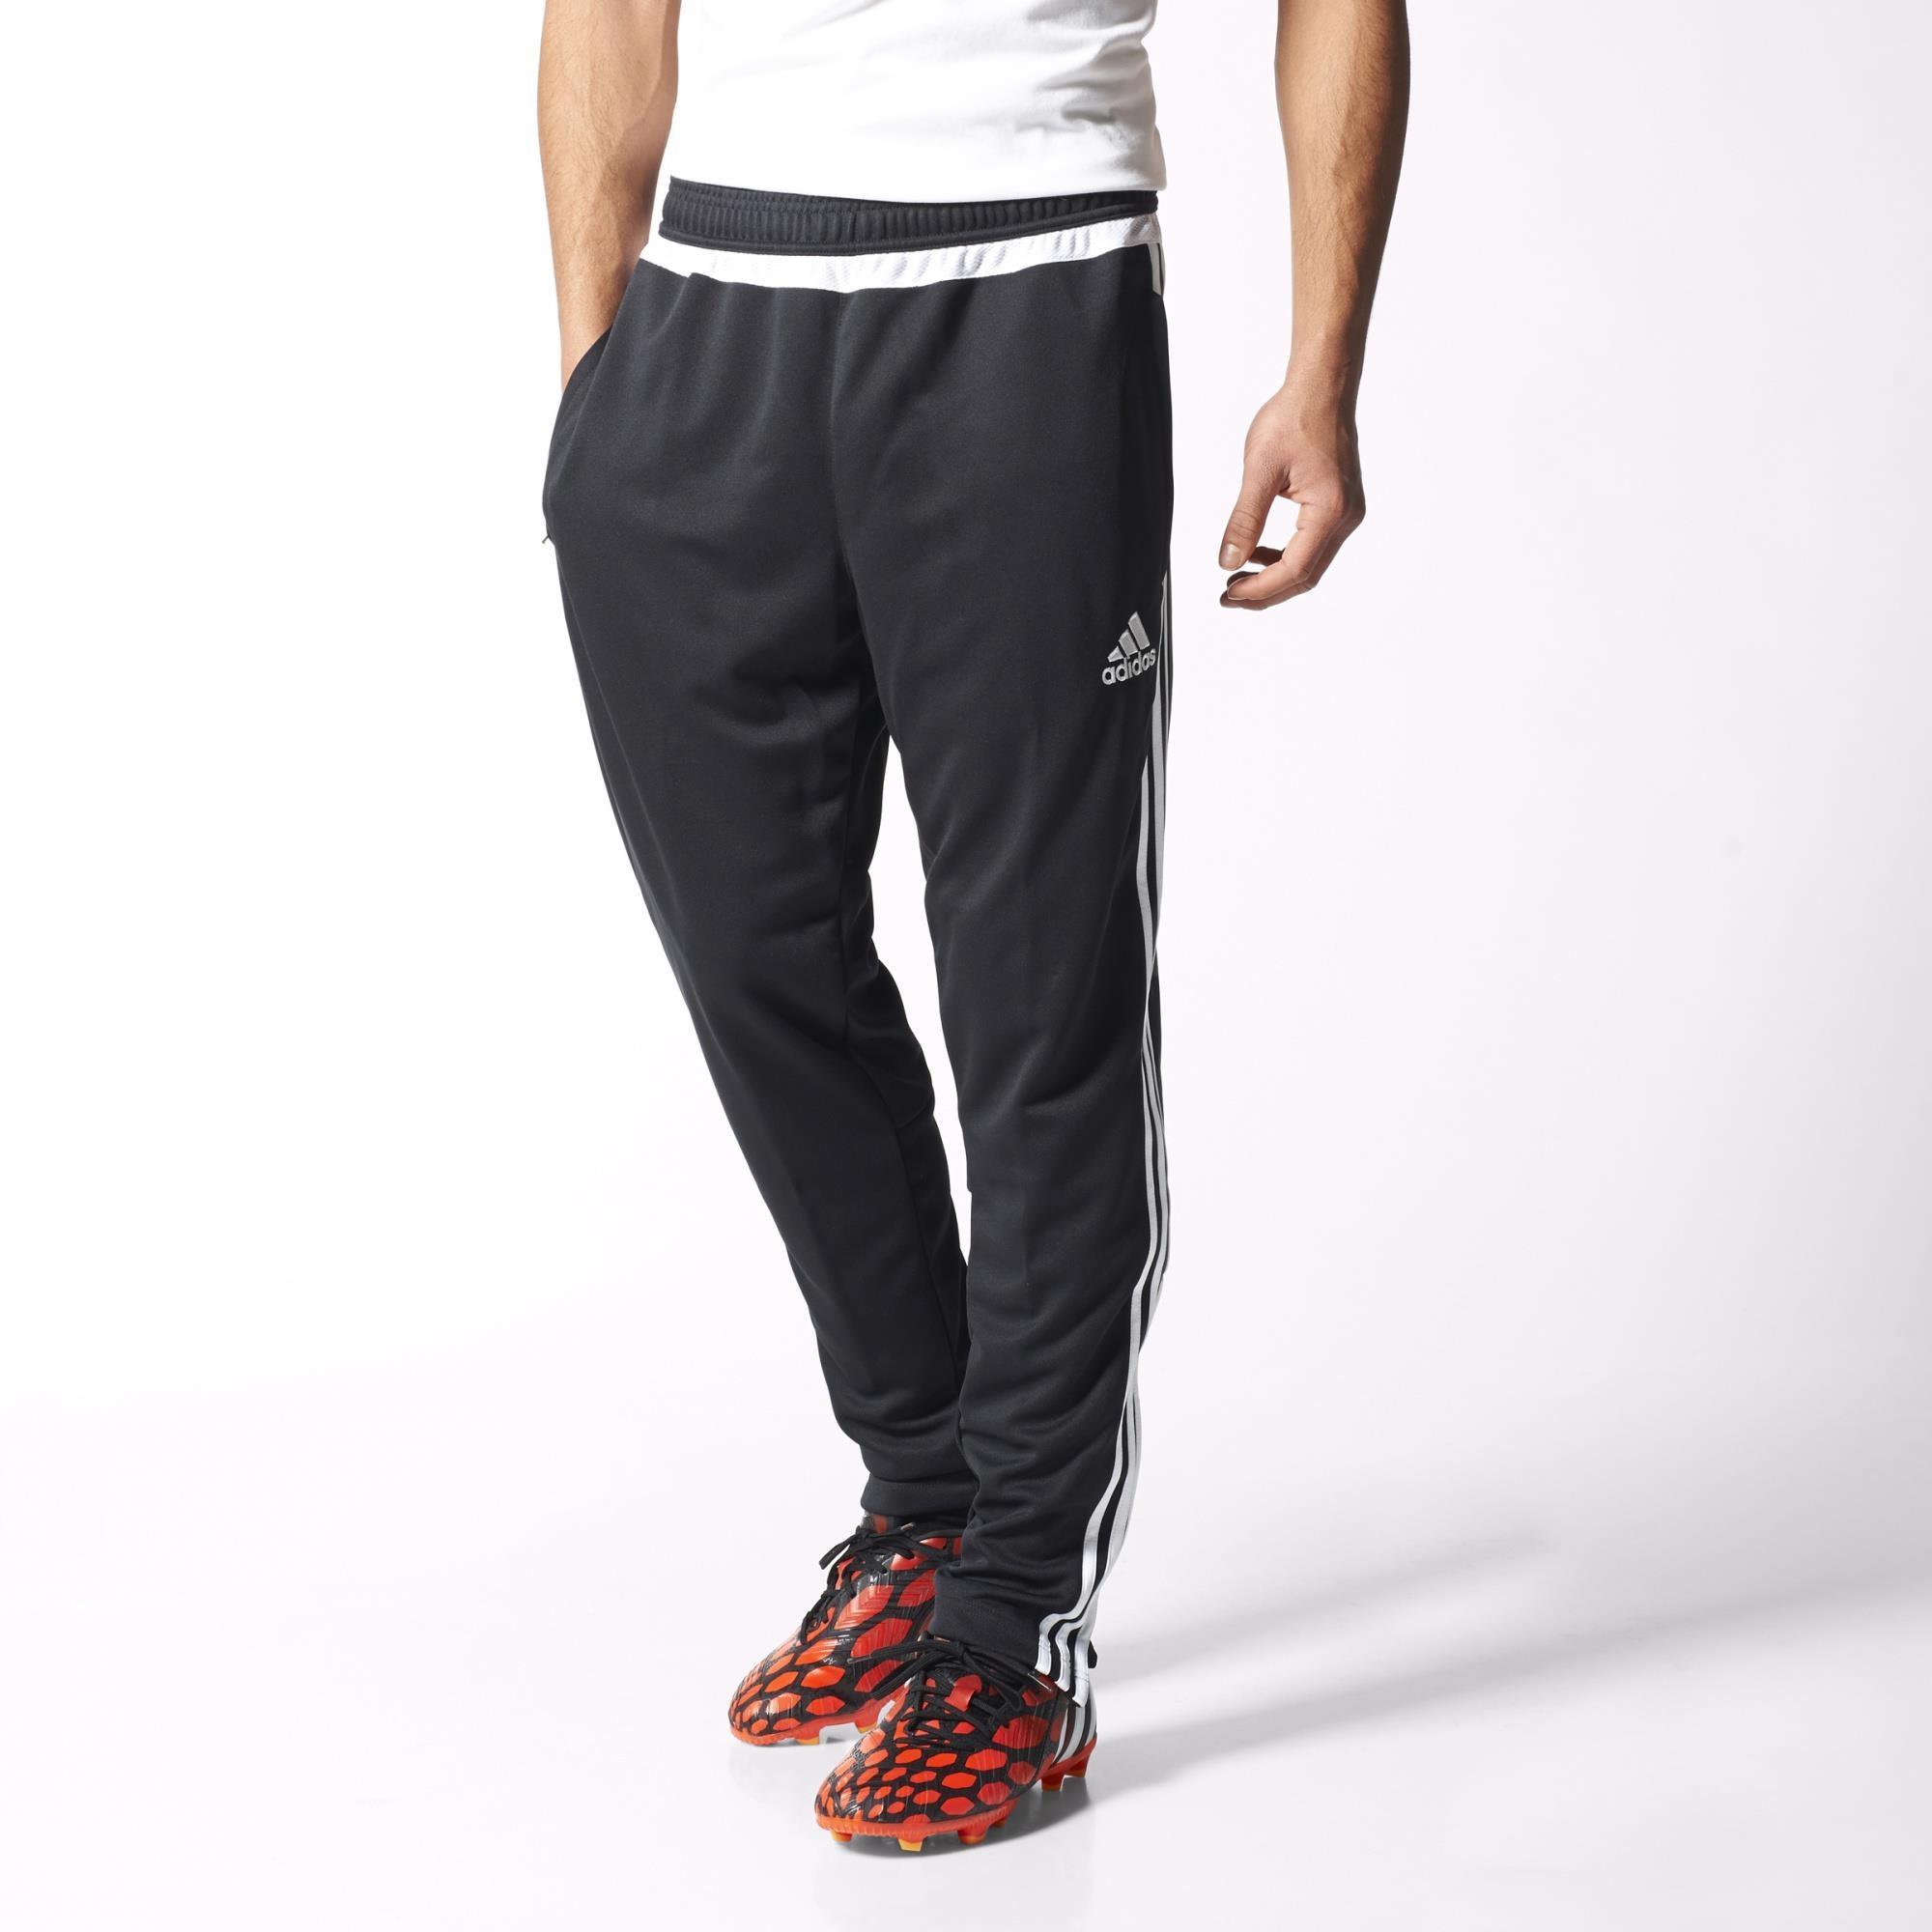 adidas tiro 15 training pants navy